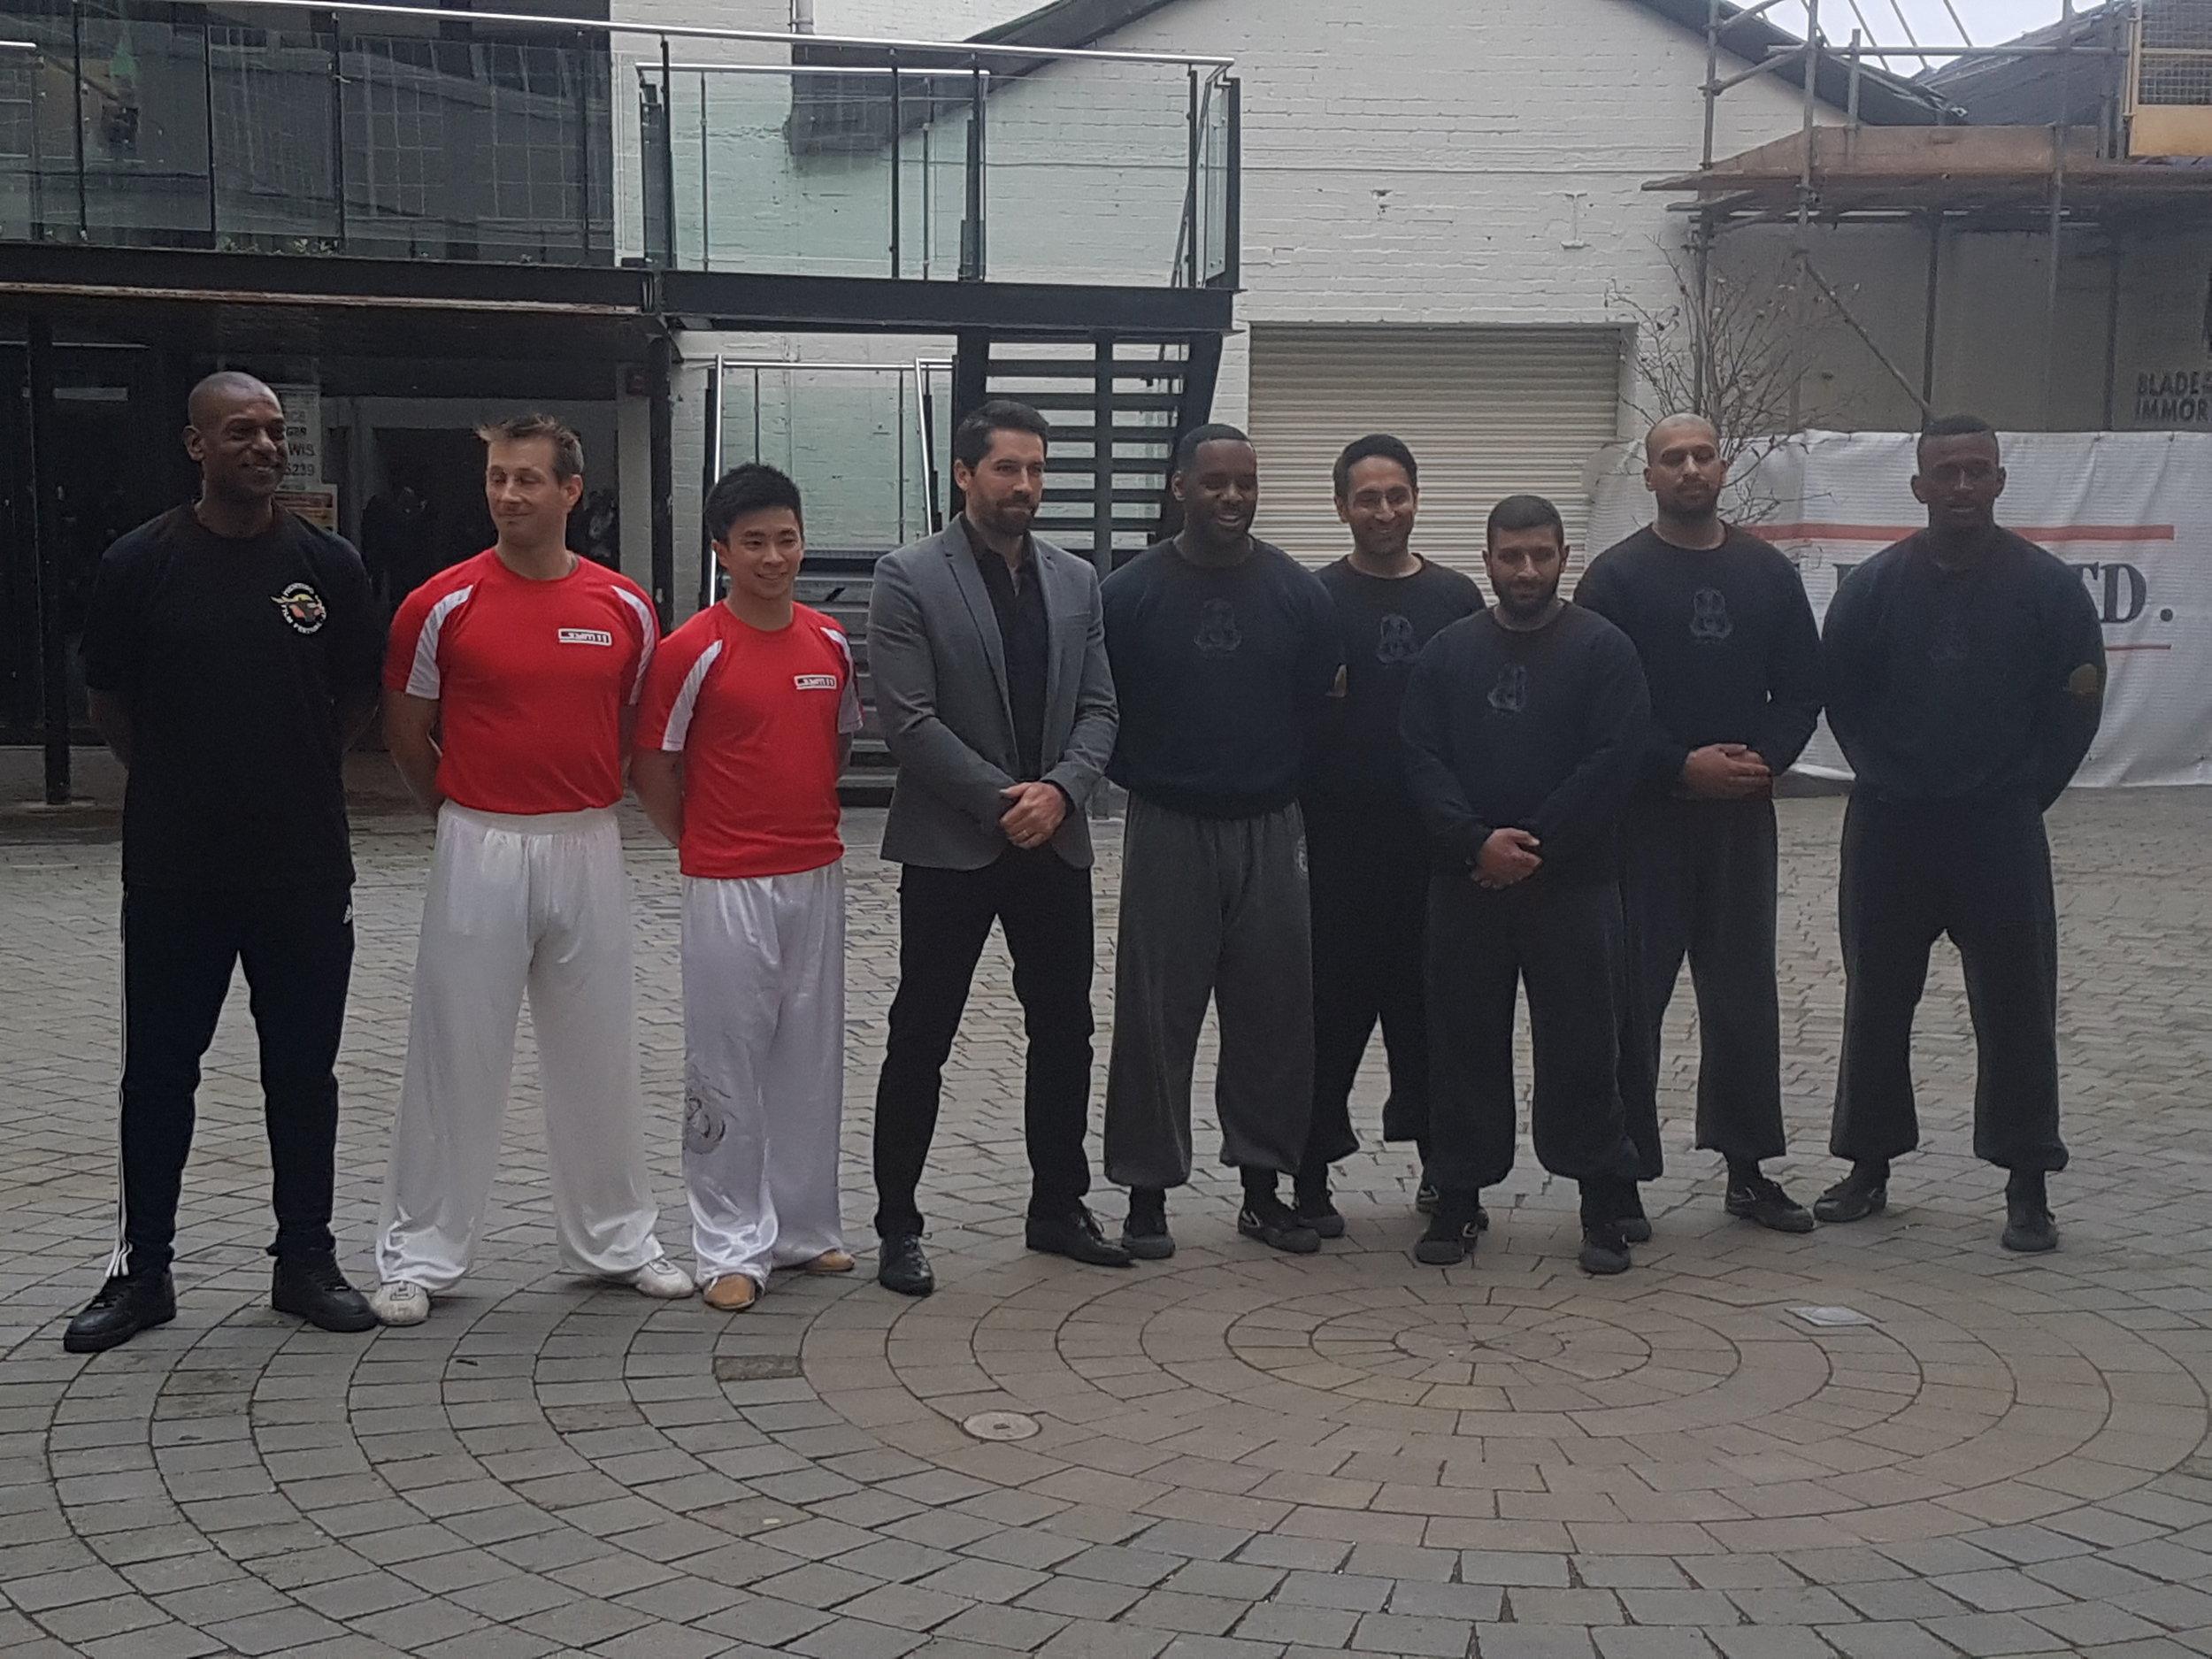 pictured:Steve Coleman, Sam Mak, Scott Adkins, and the Southern Mantis demo team: Jayson Wynters, Telvinder Singh, Aleem Khan, Harjinder Chahal, Clinton Edwards